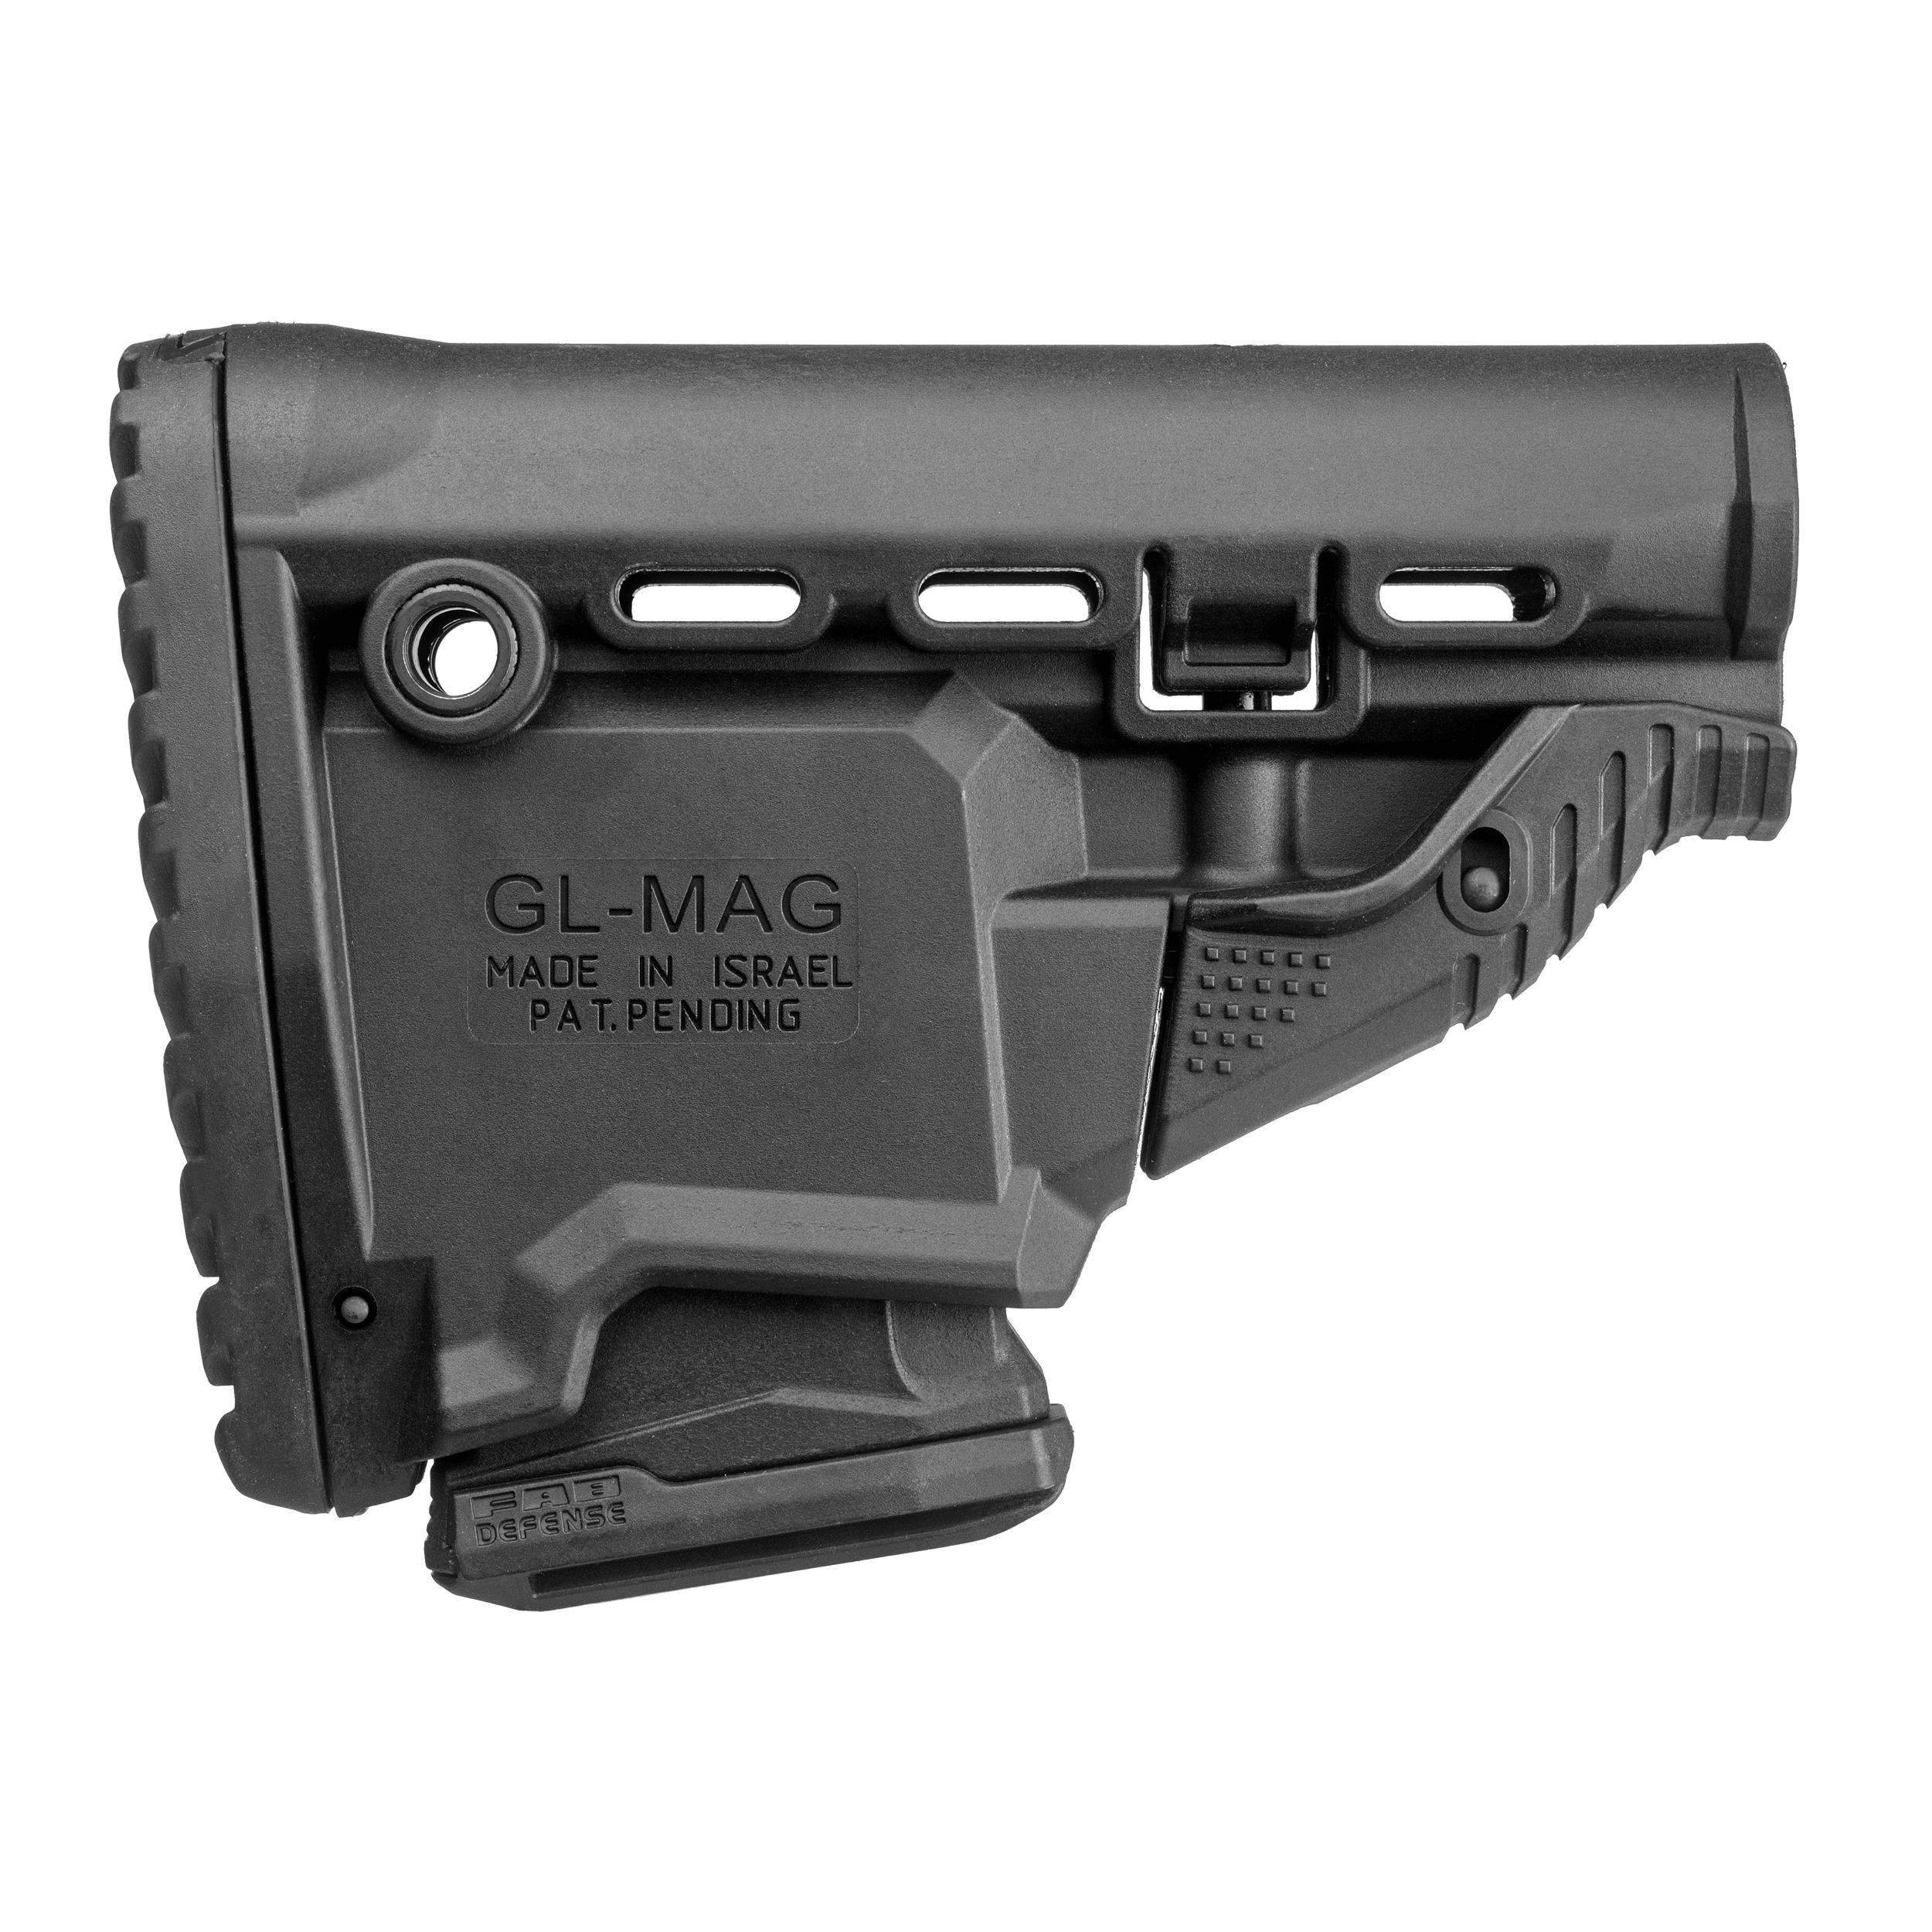 Buttstock AR15 / M16 / M4 - with 10 Round Magazine